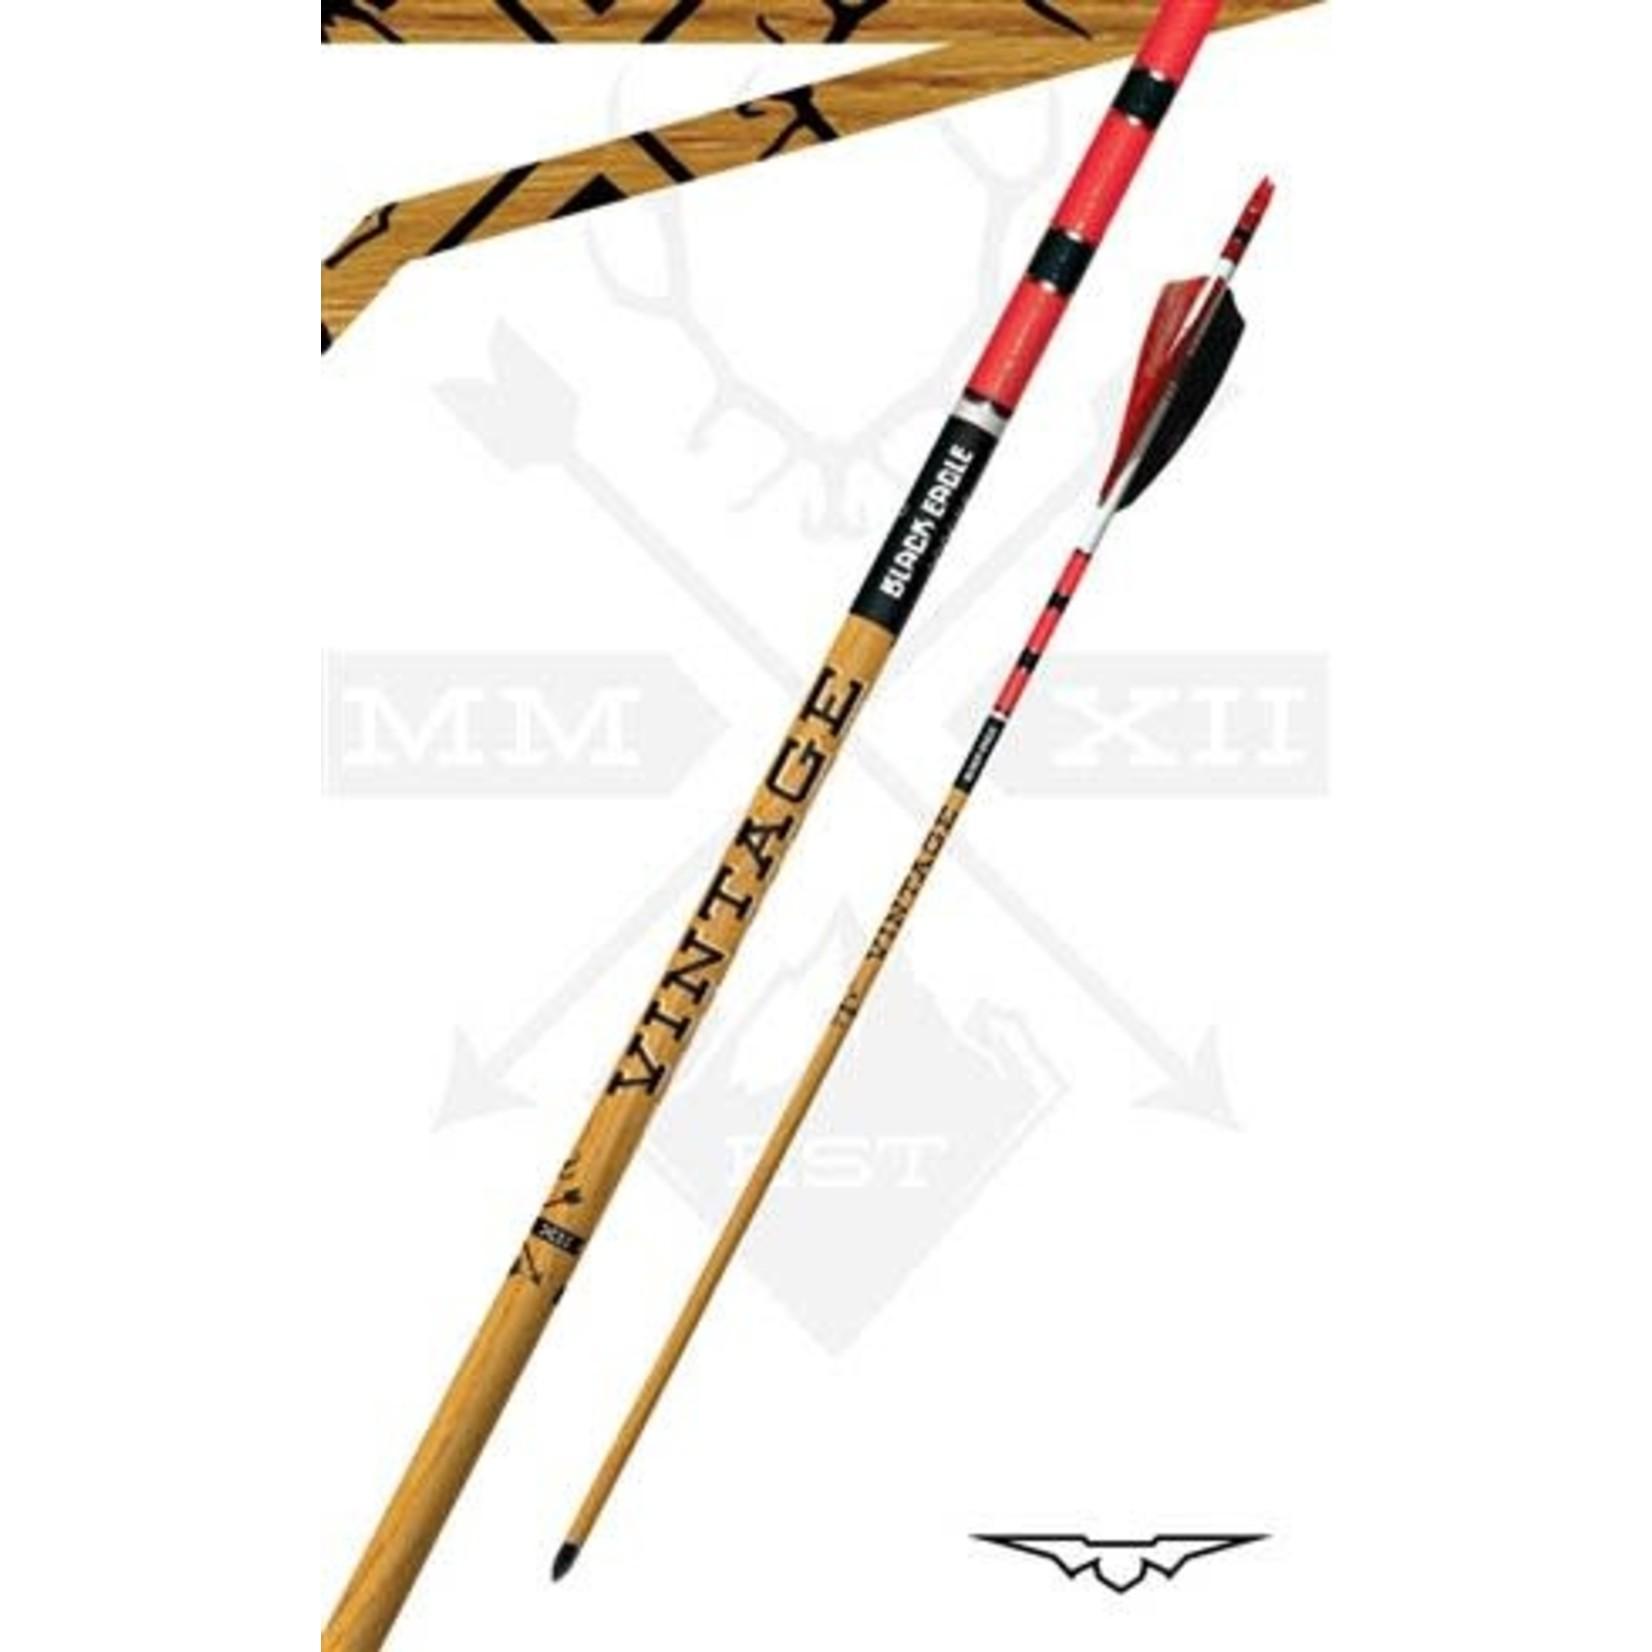 Black Eagle Black Eagle Vintage  Crested Feathered Arrows 600 (6 Pk)